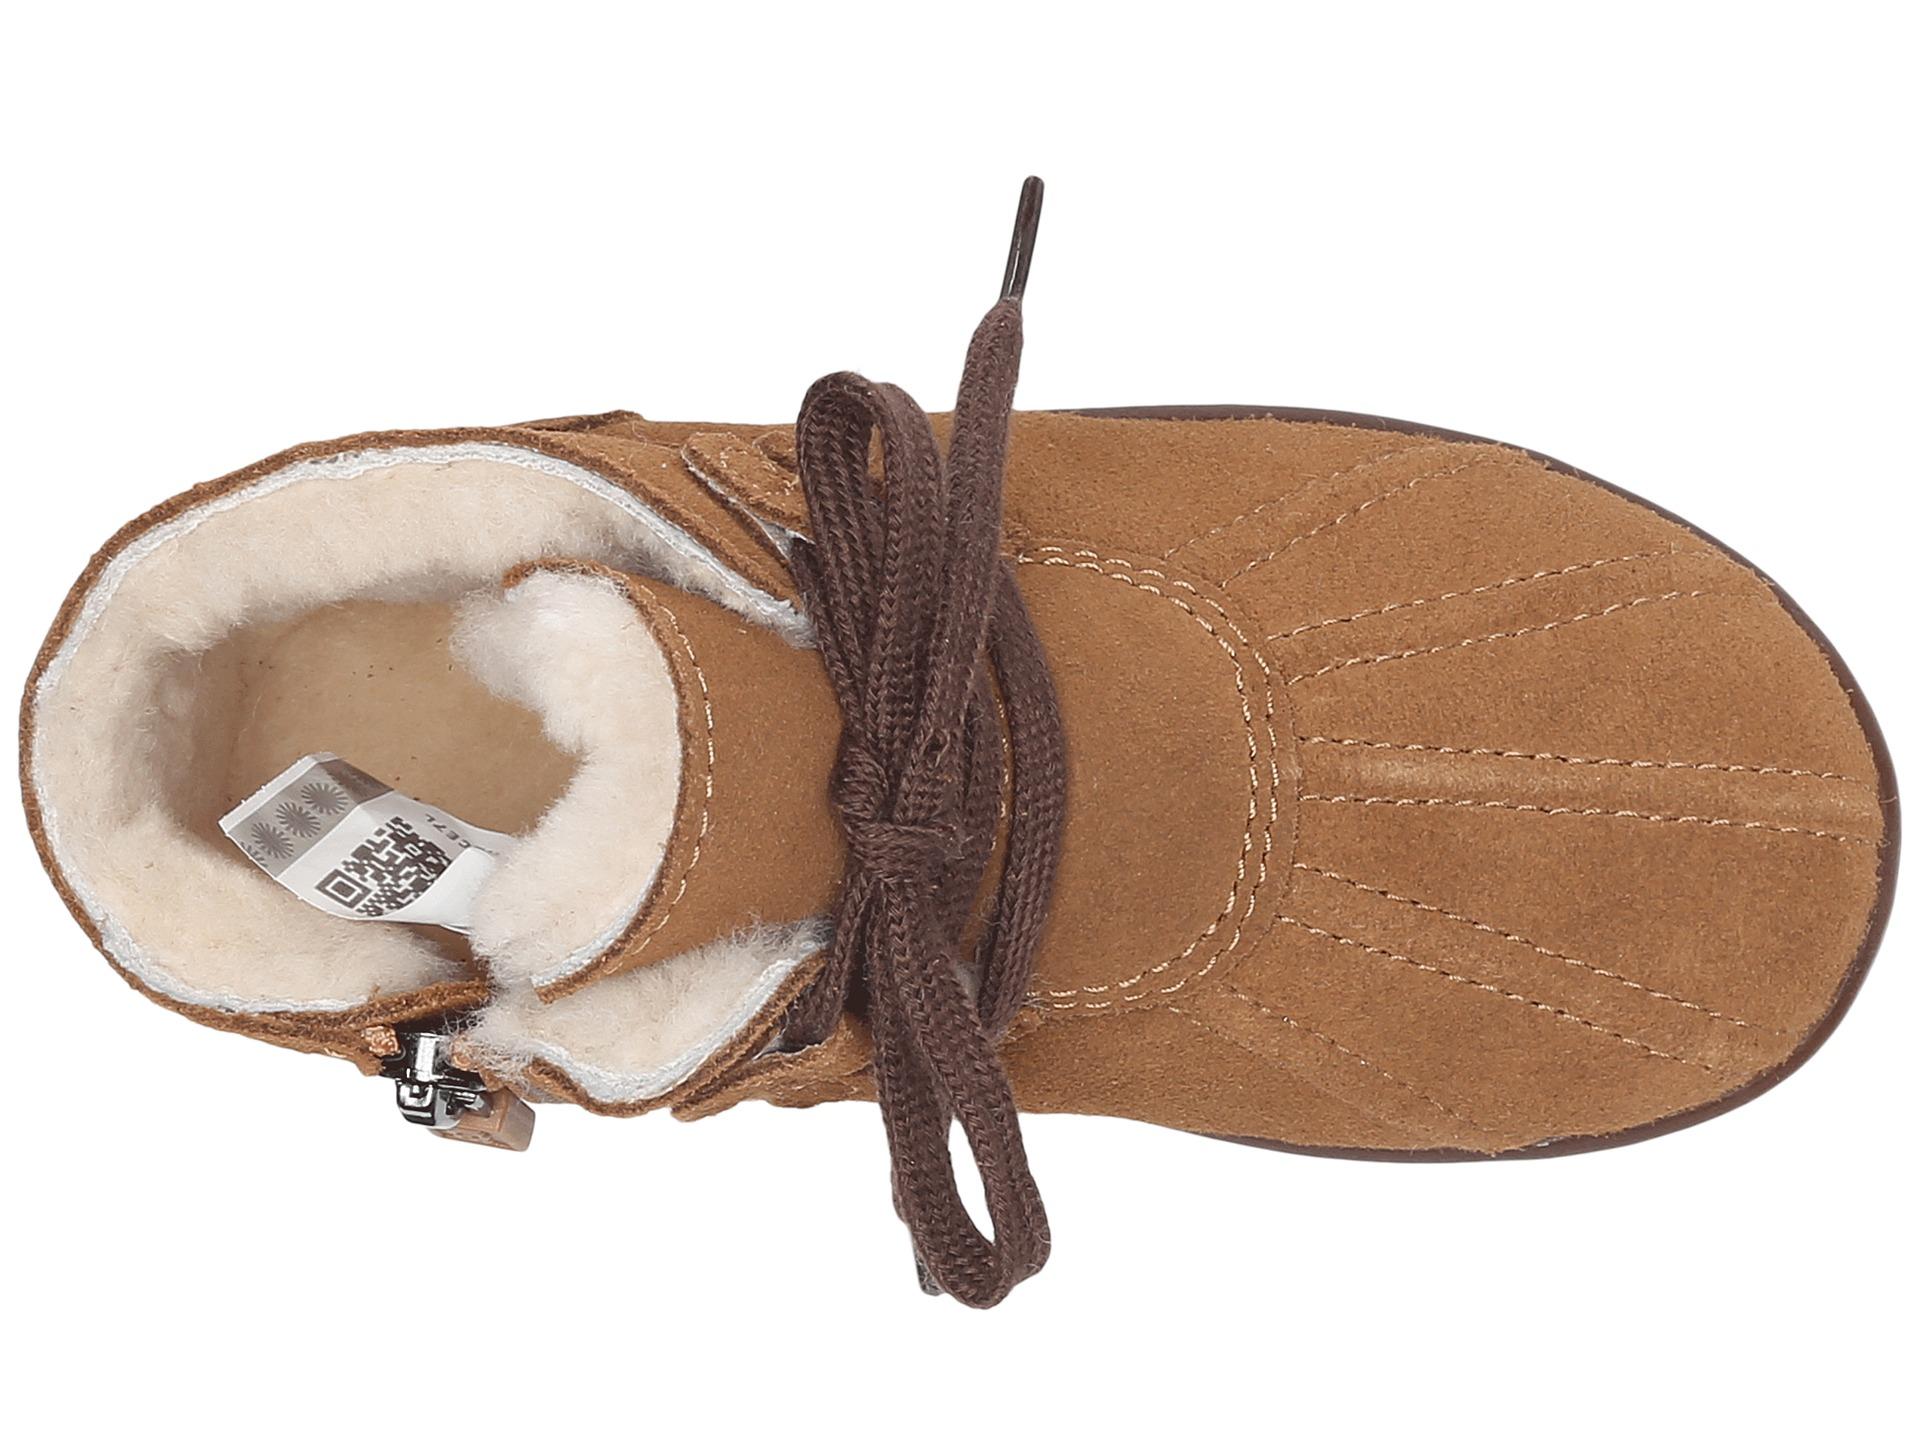 Ugg Kids Payten T Kids Shoes Chestnut Suede